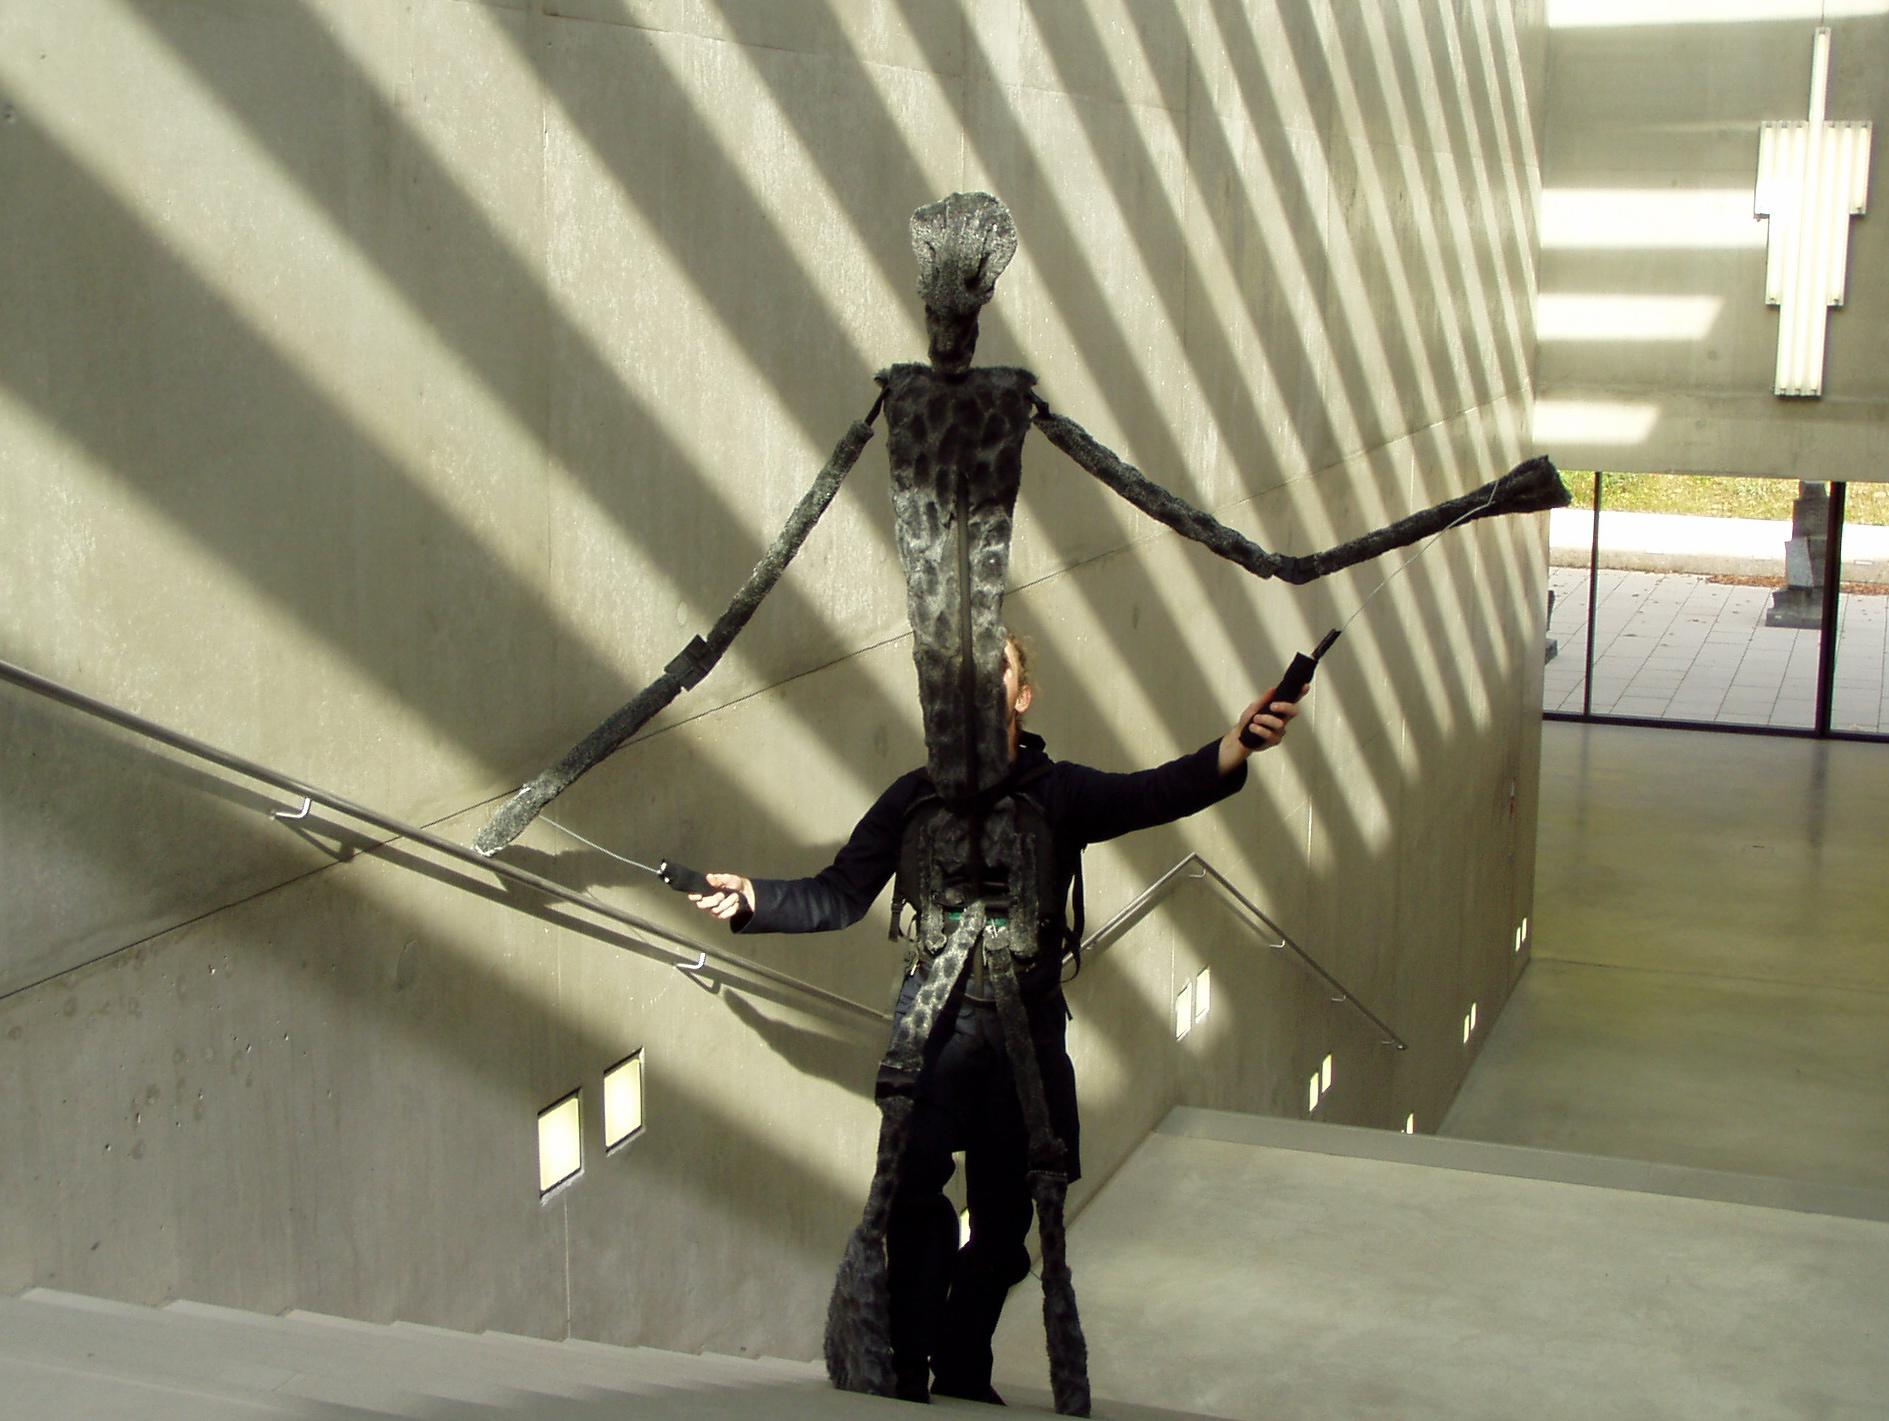 http://upload.wikimedia.org/wikipedia/commons/0/0e/Karin-schaefer-puppet-museum-modern-art-salzburg.jpg